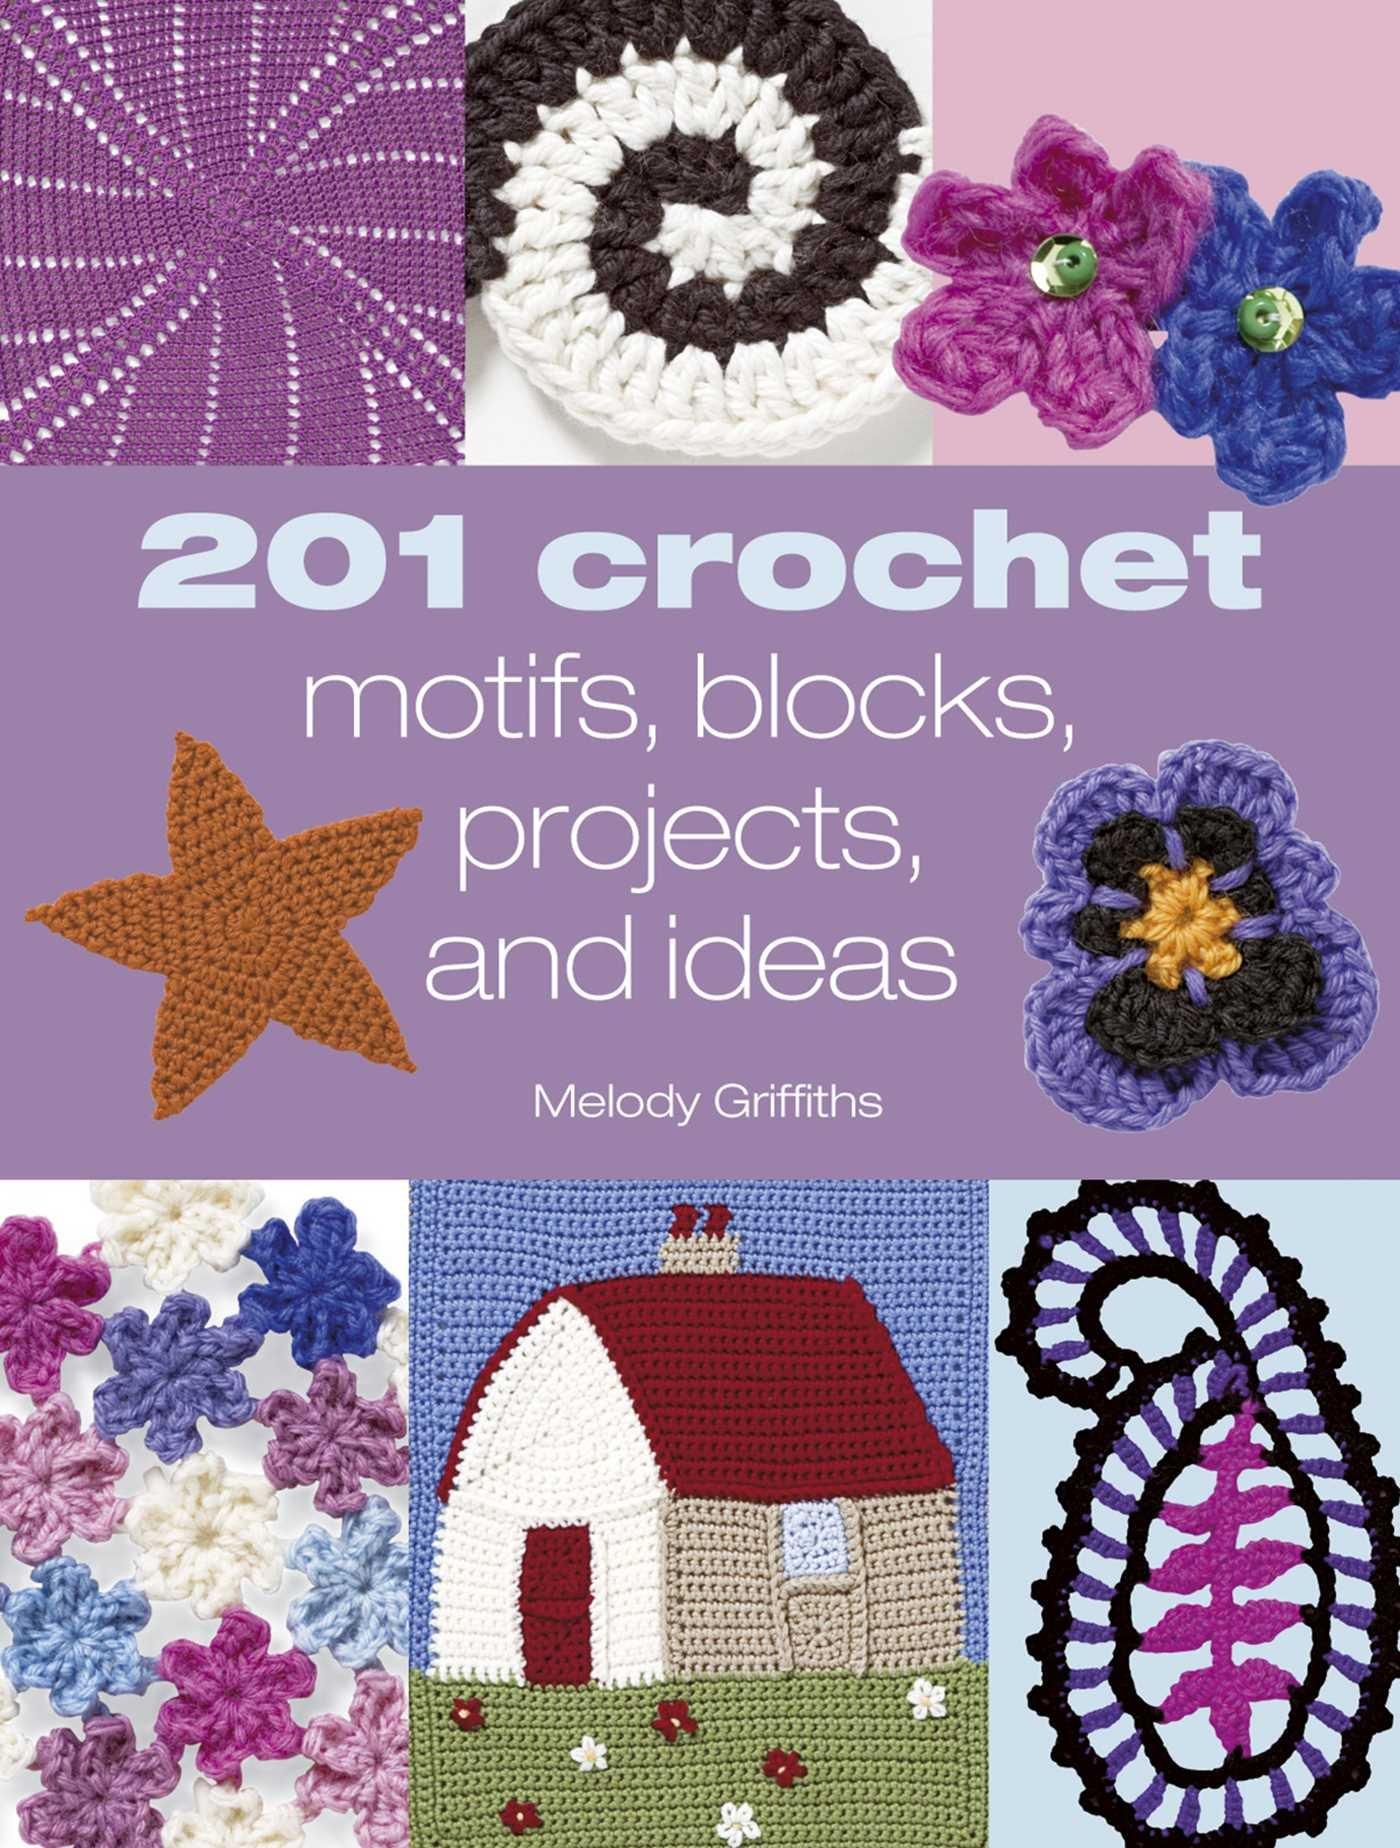 201-crochet-motifs-blocks-projects-and-ideas